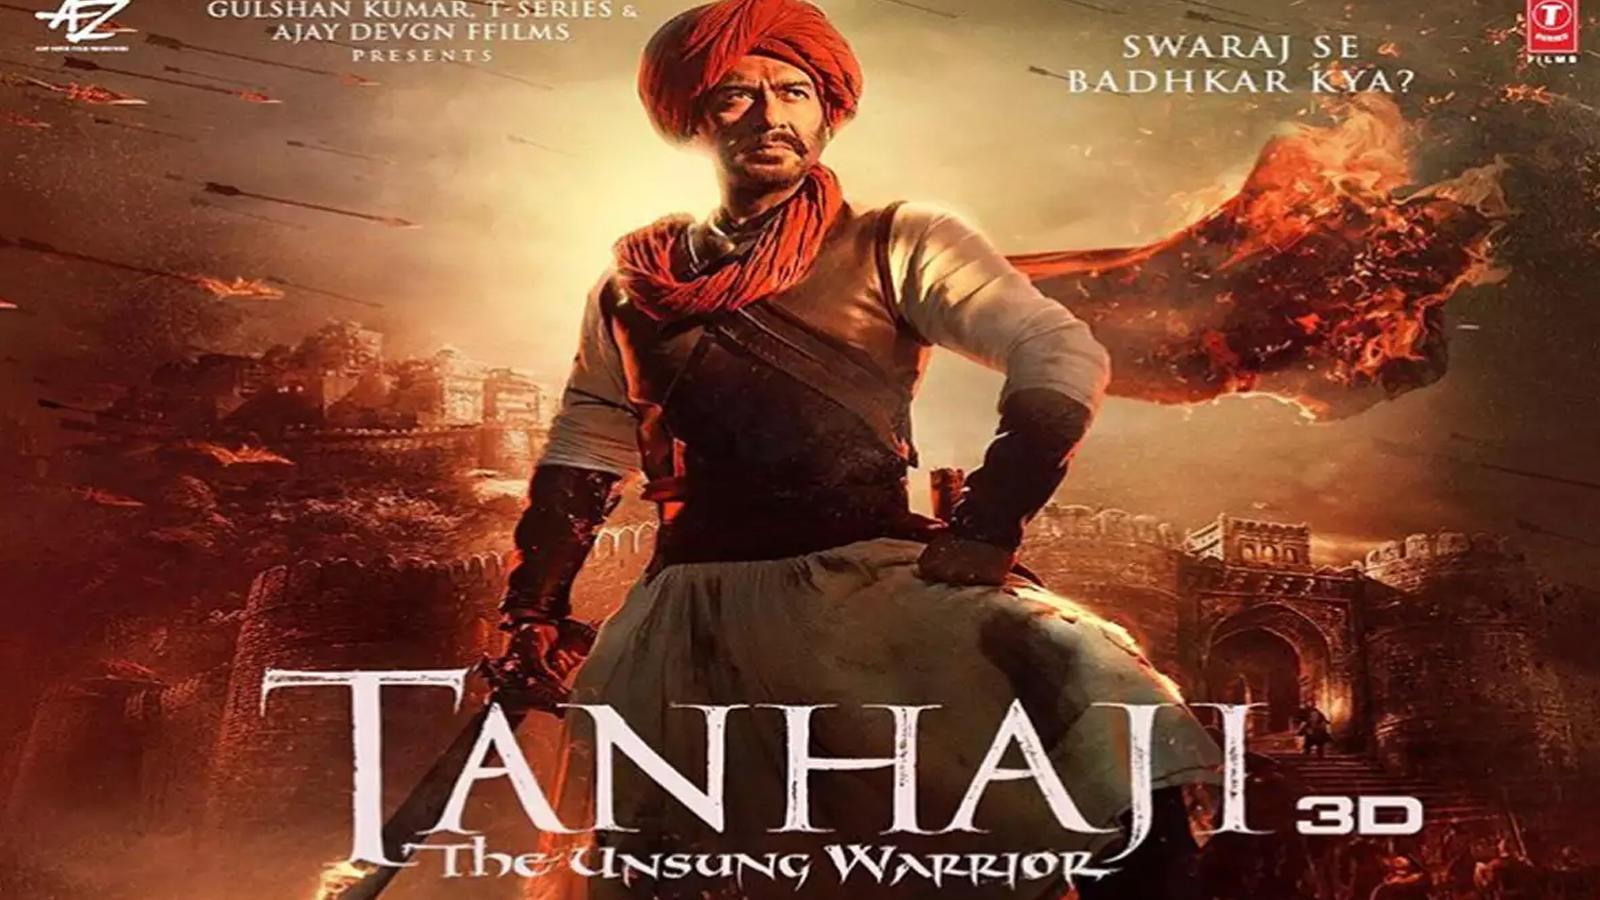 ajay-devgn-starrer-tanhaji-the-unsung-warrior-lands-in-trouble